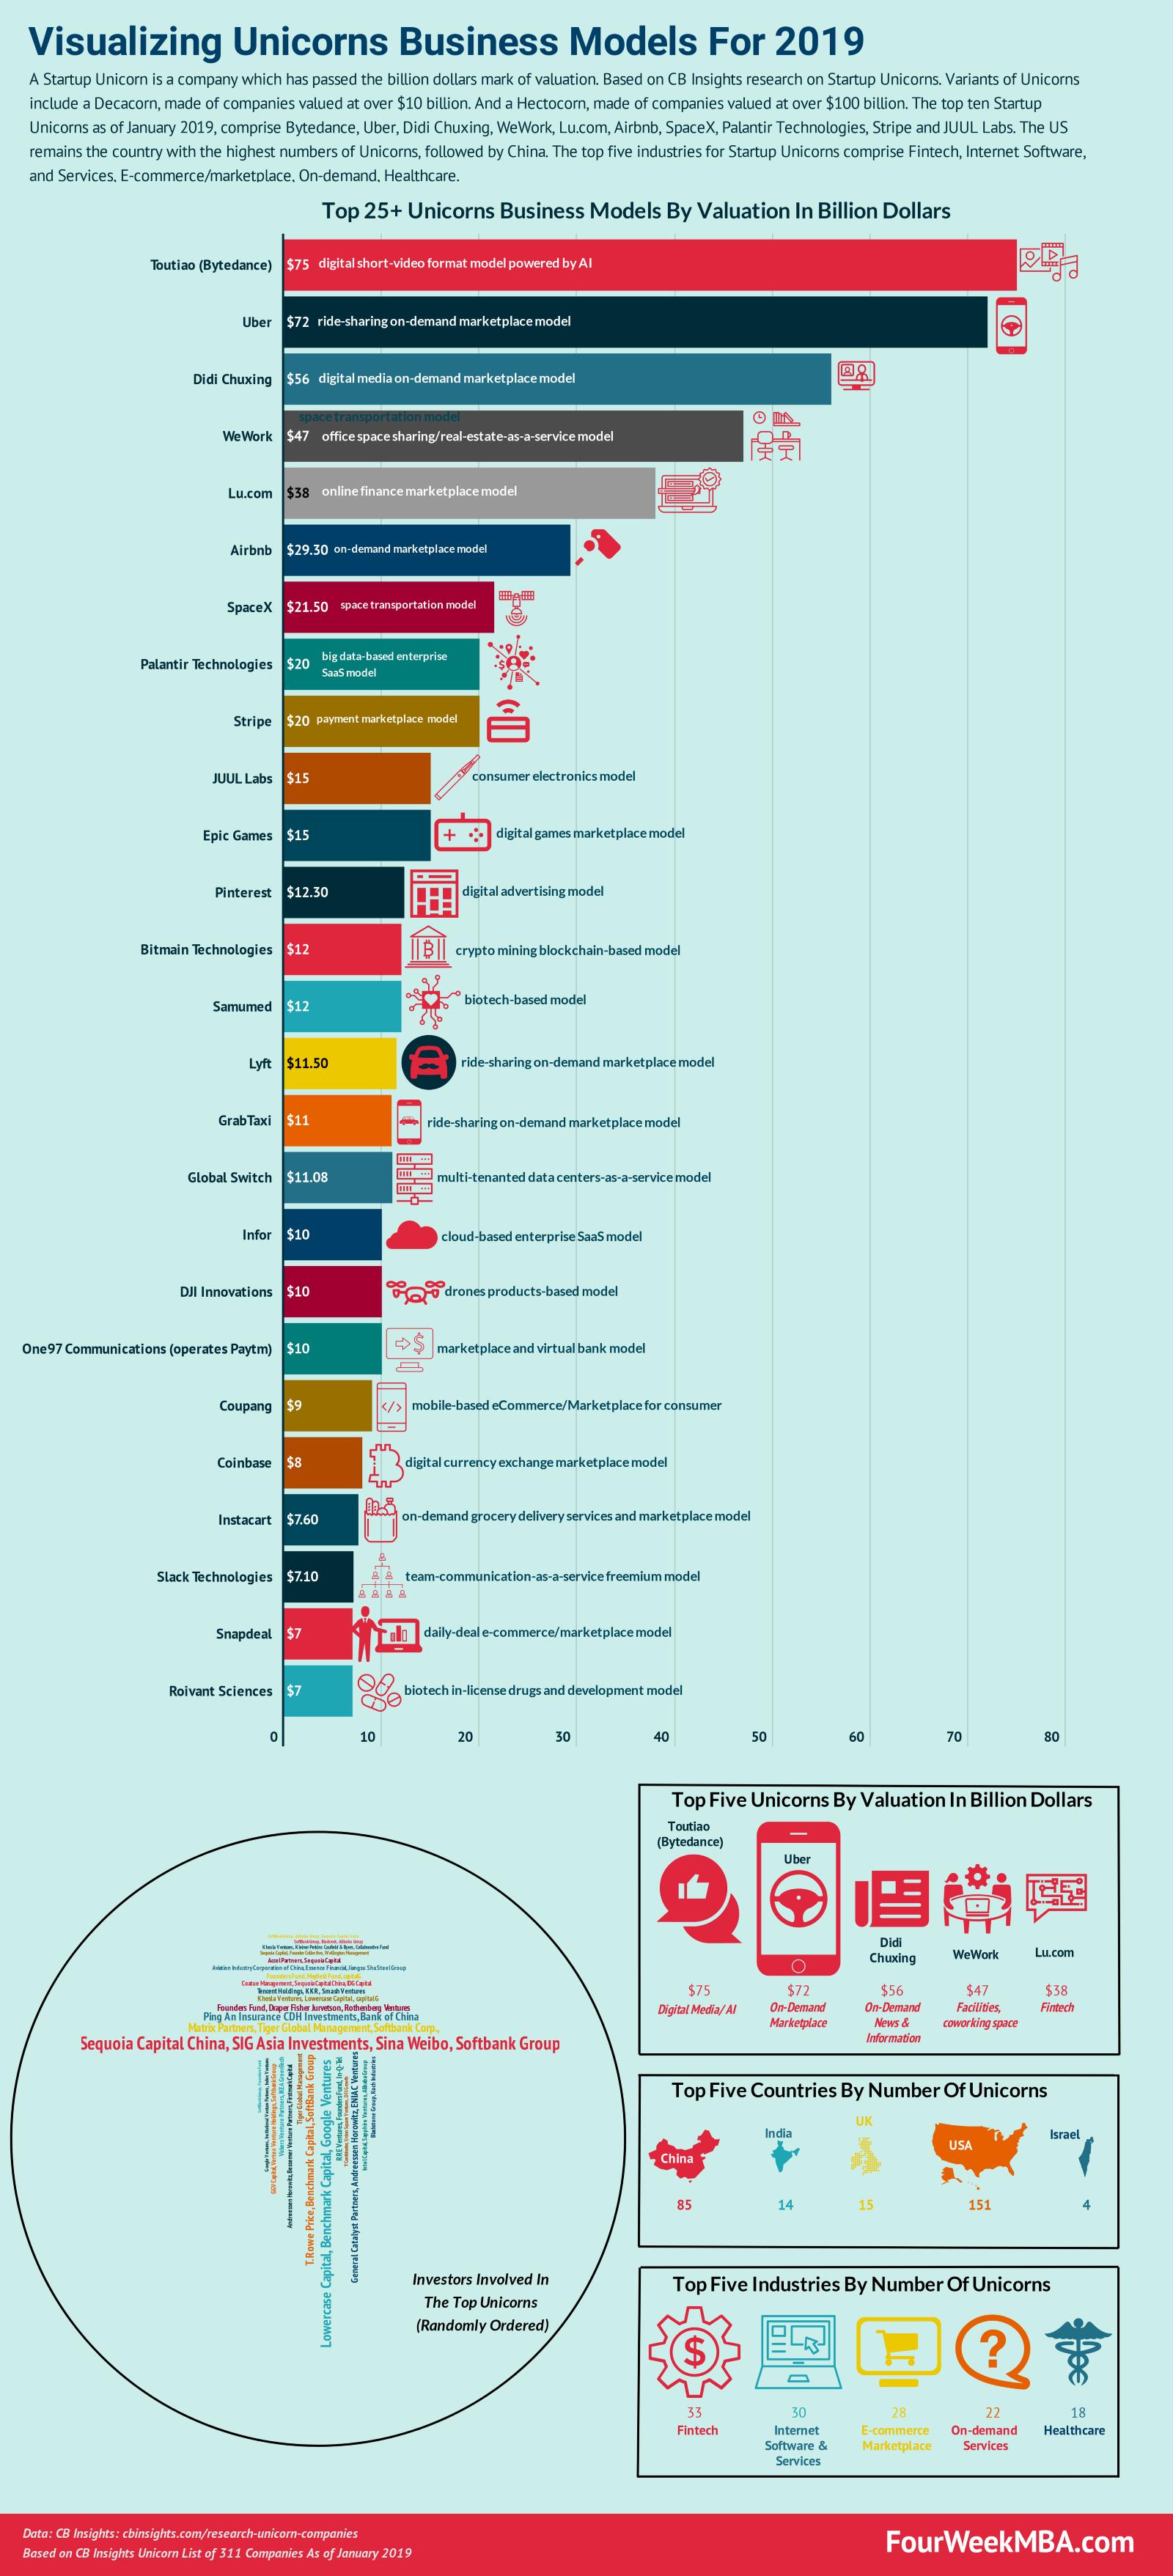 /visualizing-unicorns-companies-for-2019-2fef4c0bde40 feature image